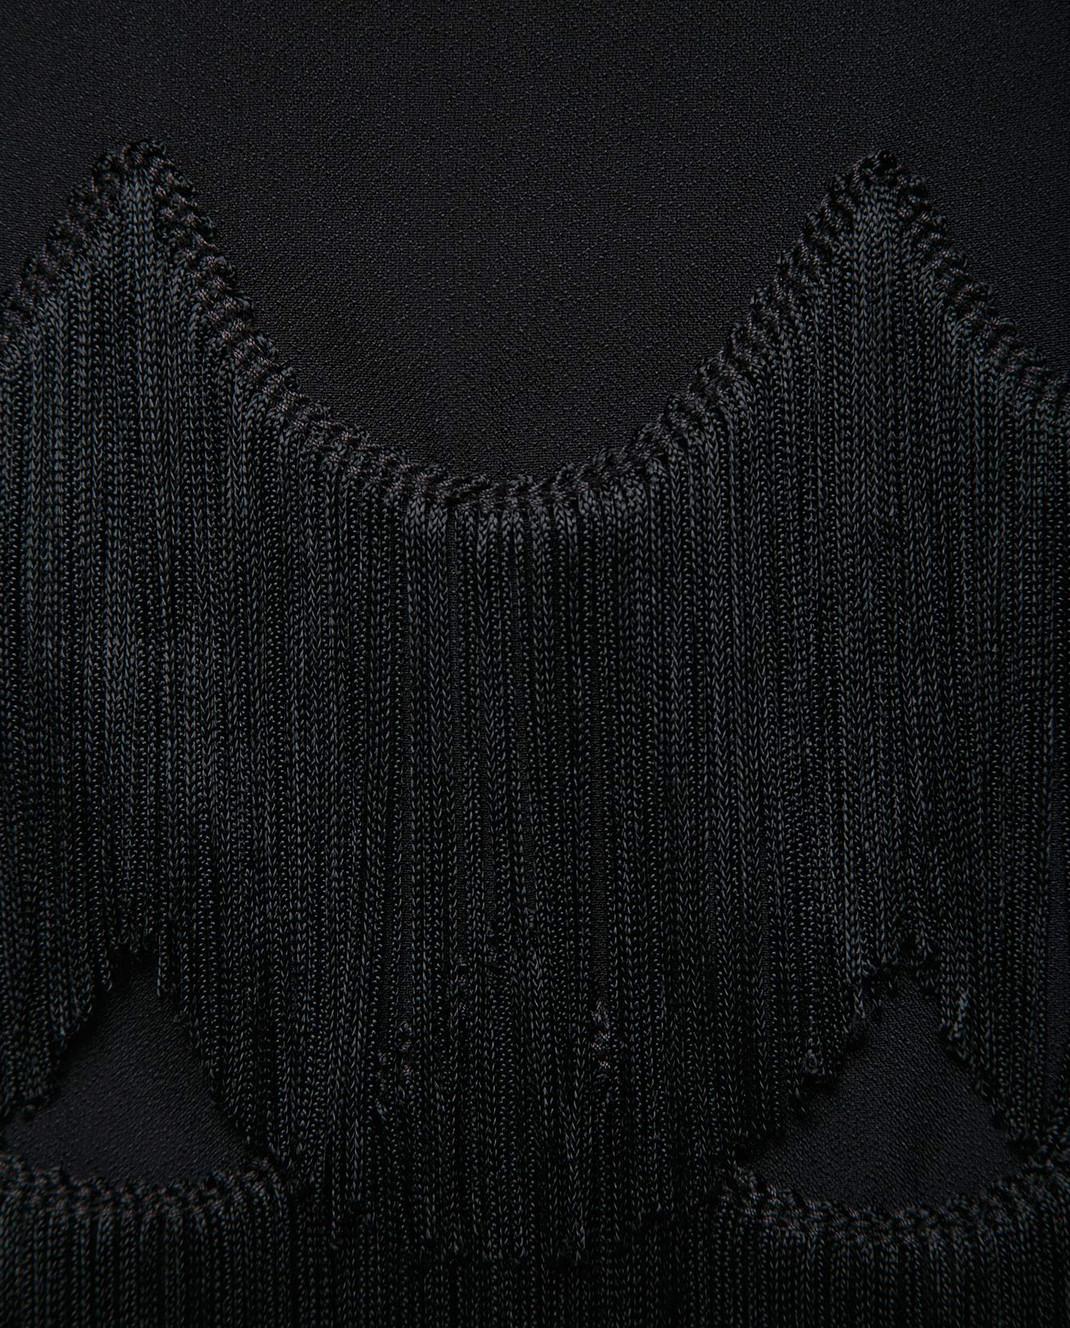 Marc Jacobs Черная юбка с бахромой M4007161 изображение 5